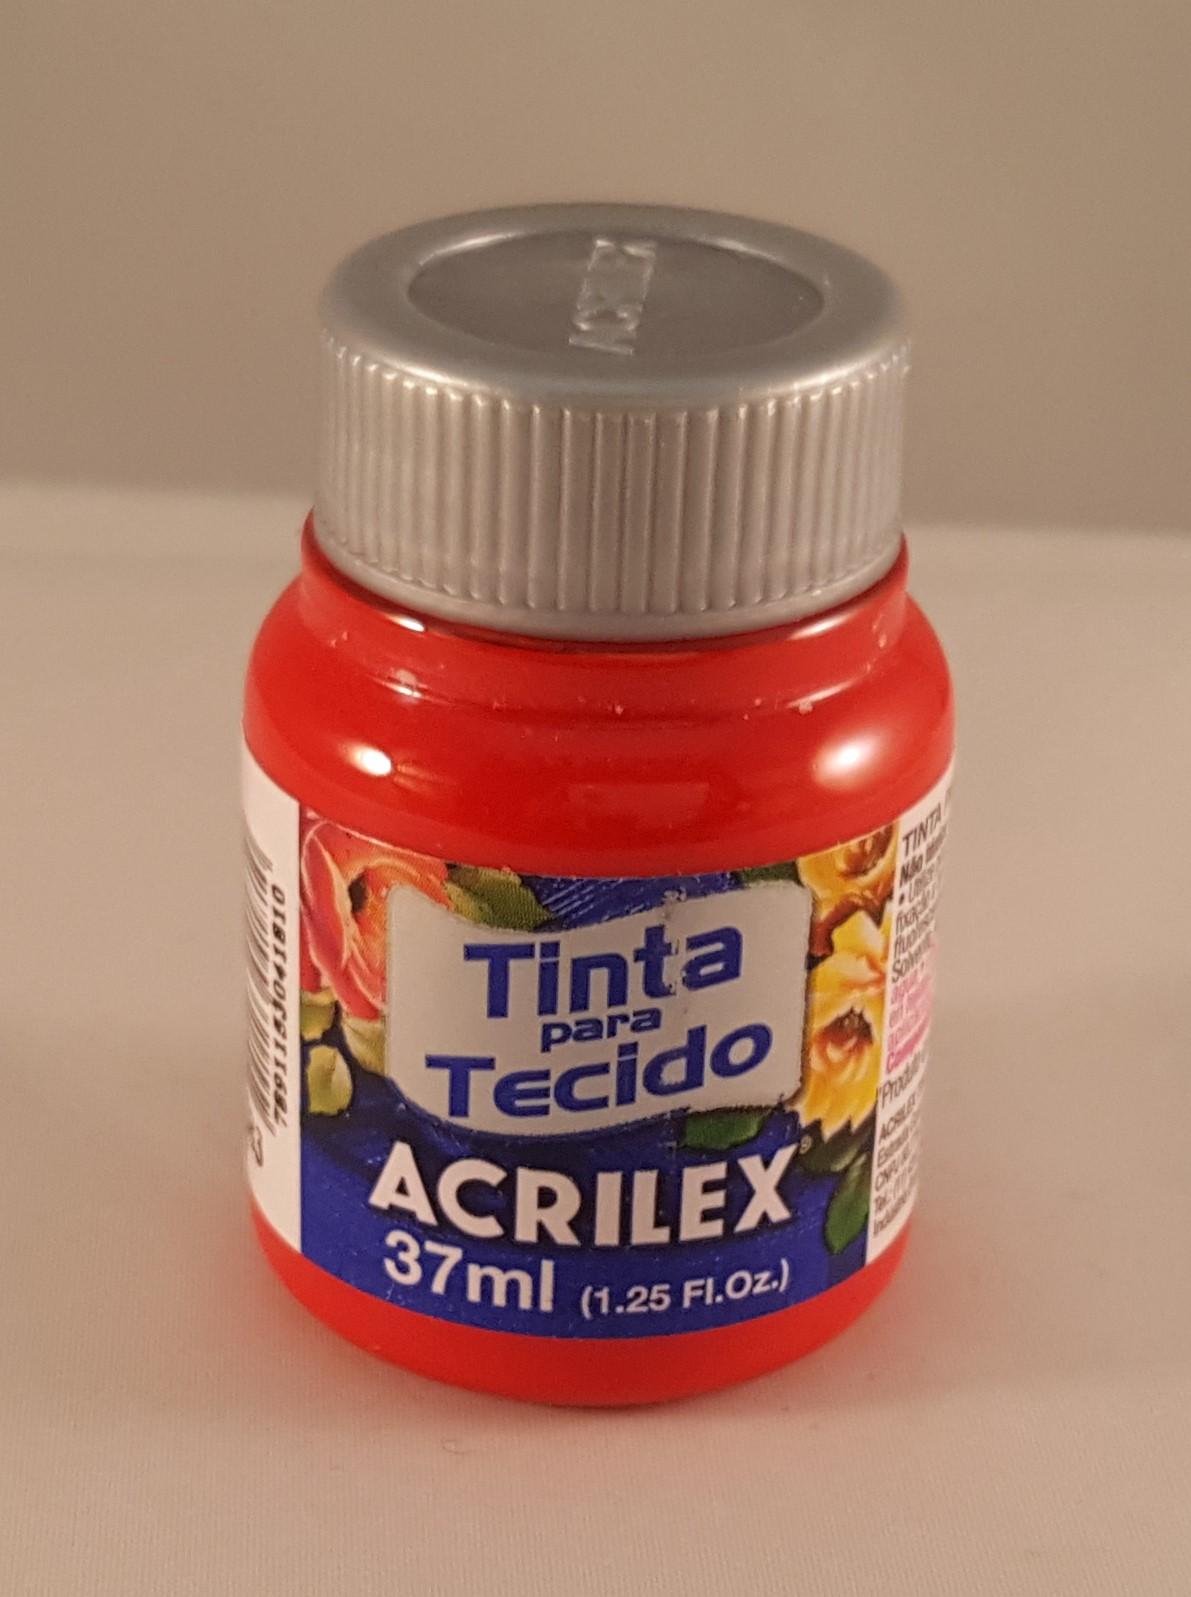 Tinta Tecido Acrilex vermelho tomate 583